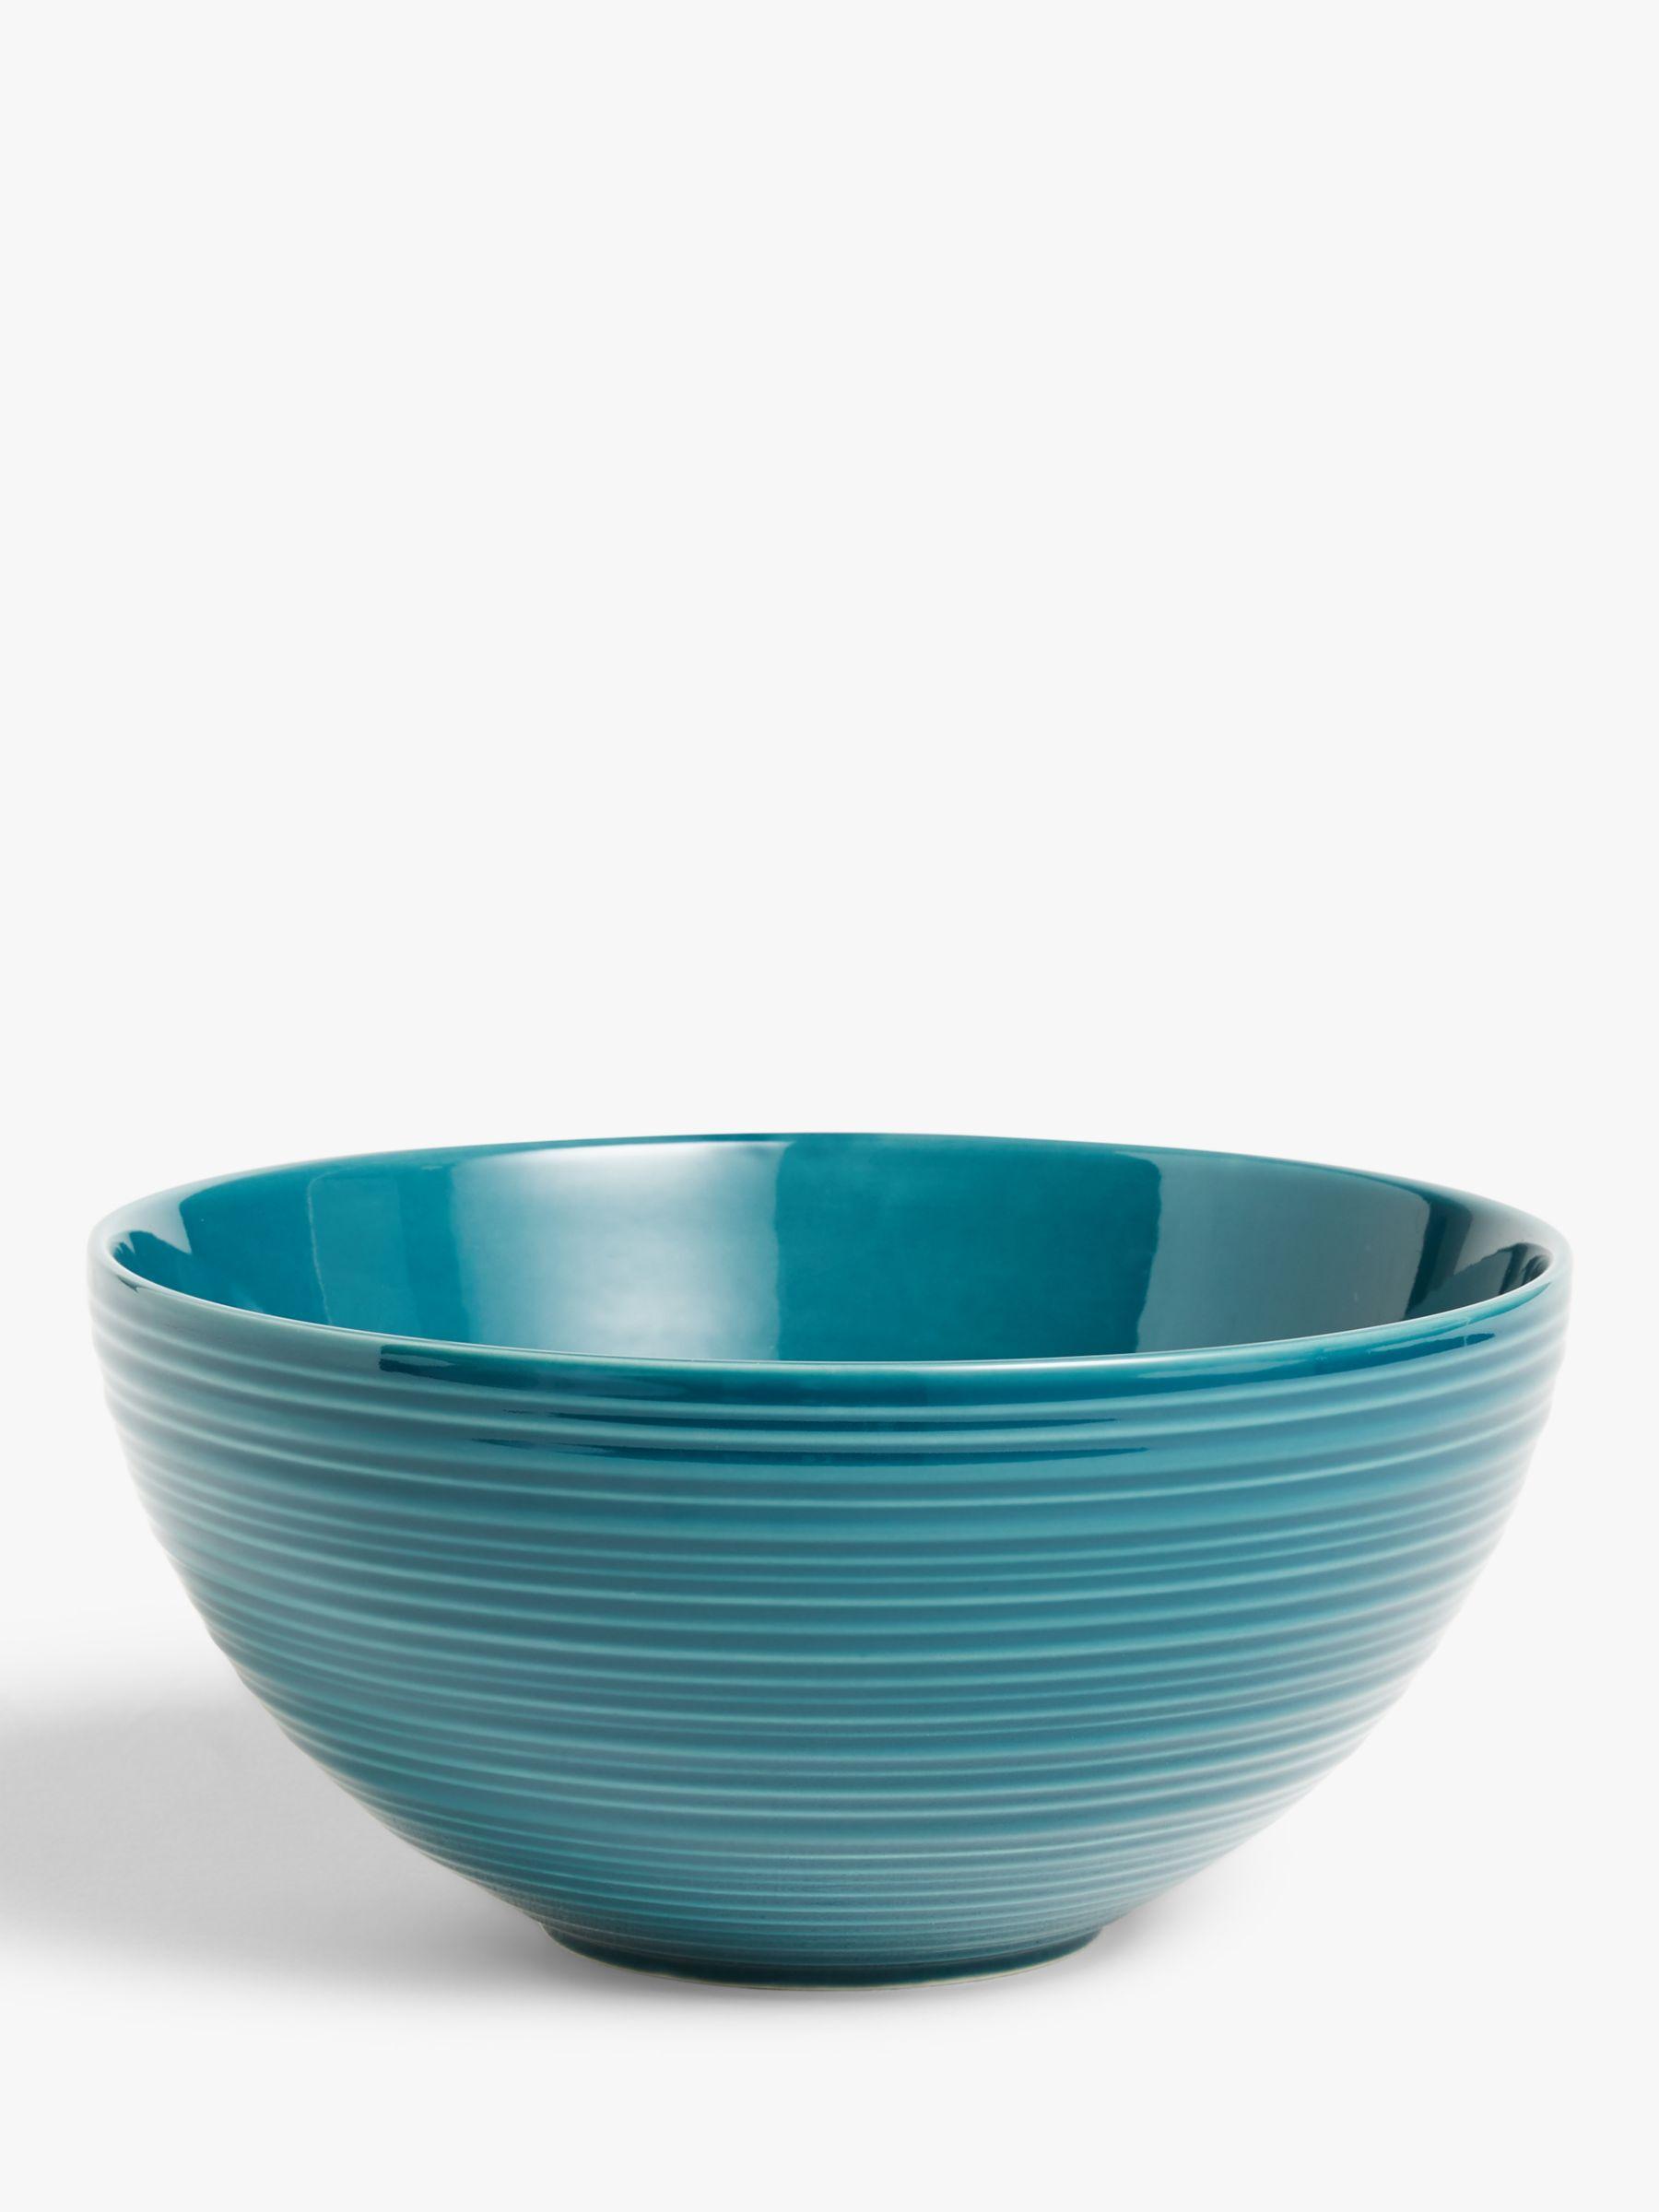 John Lewis & Partners Ribbed Ceramic Mixing Bowl, Large, Teal